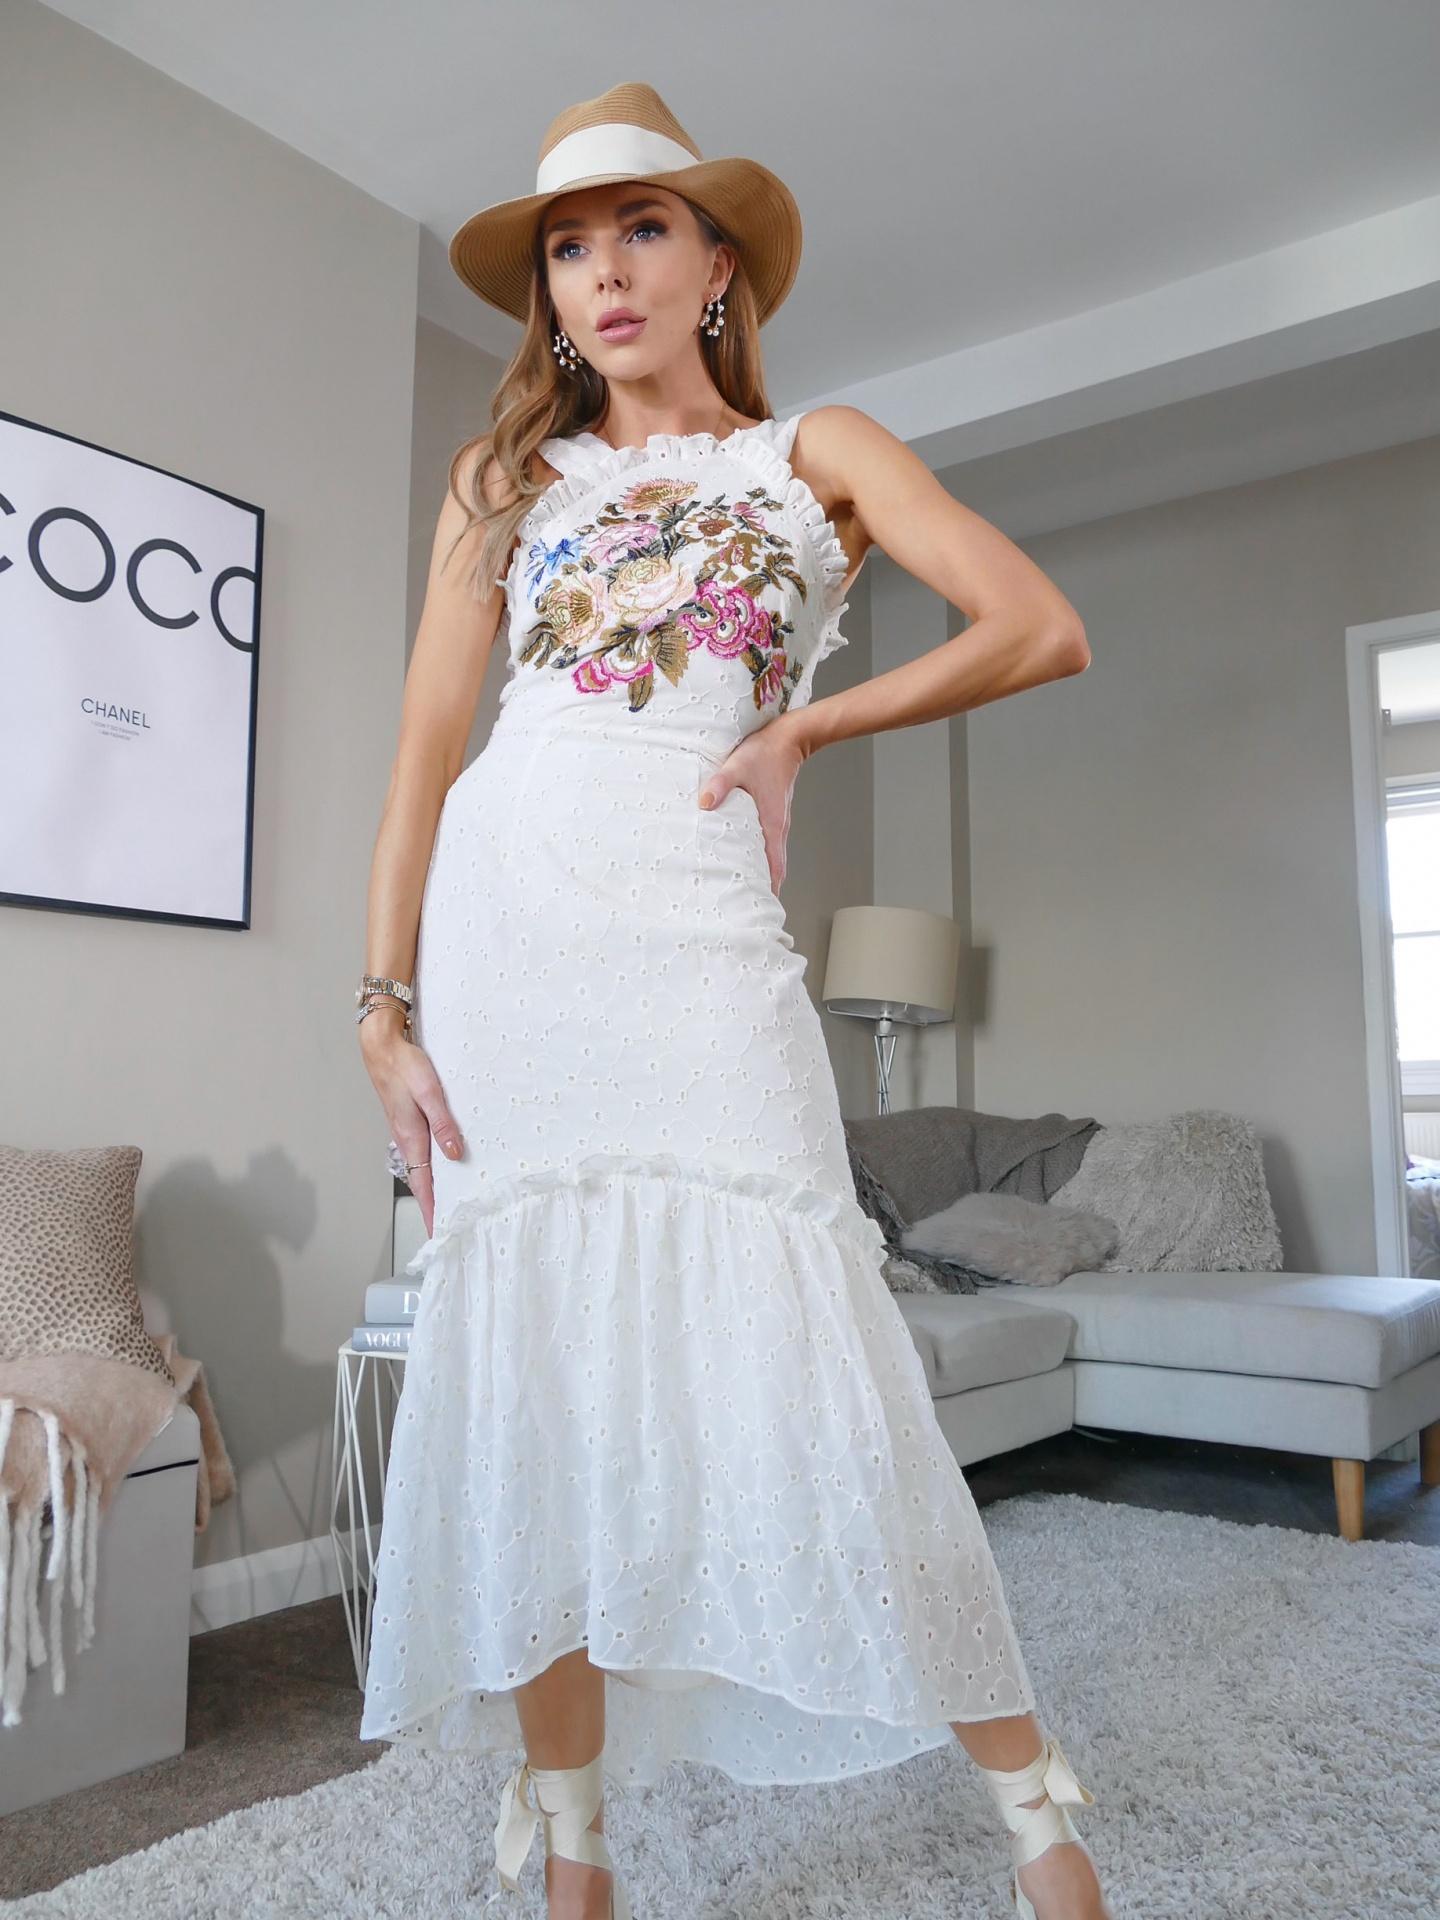 falke, tights, legs, hosiery, stockings, summer dress, floral dress, laura blair